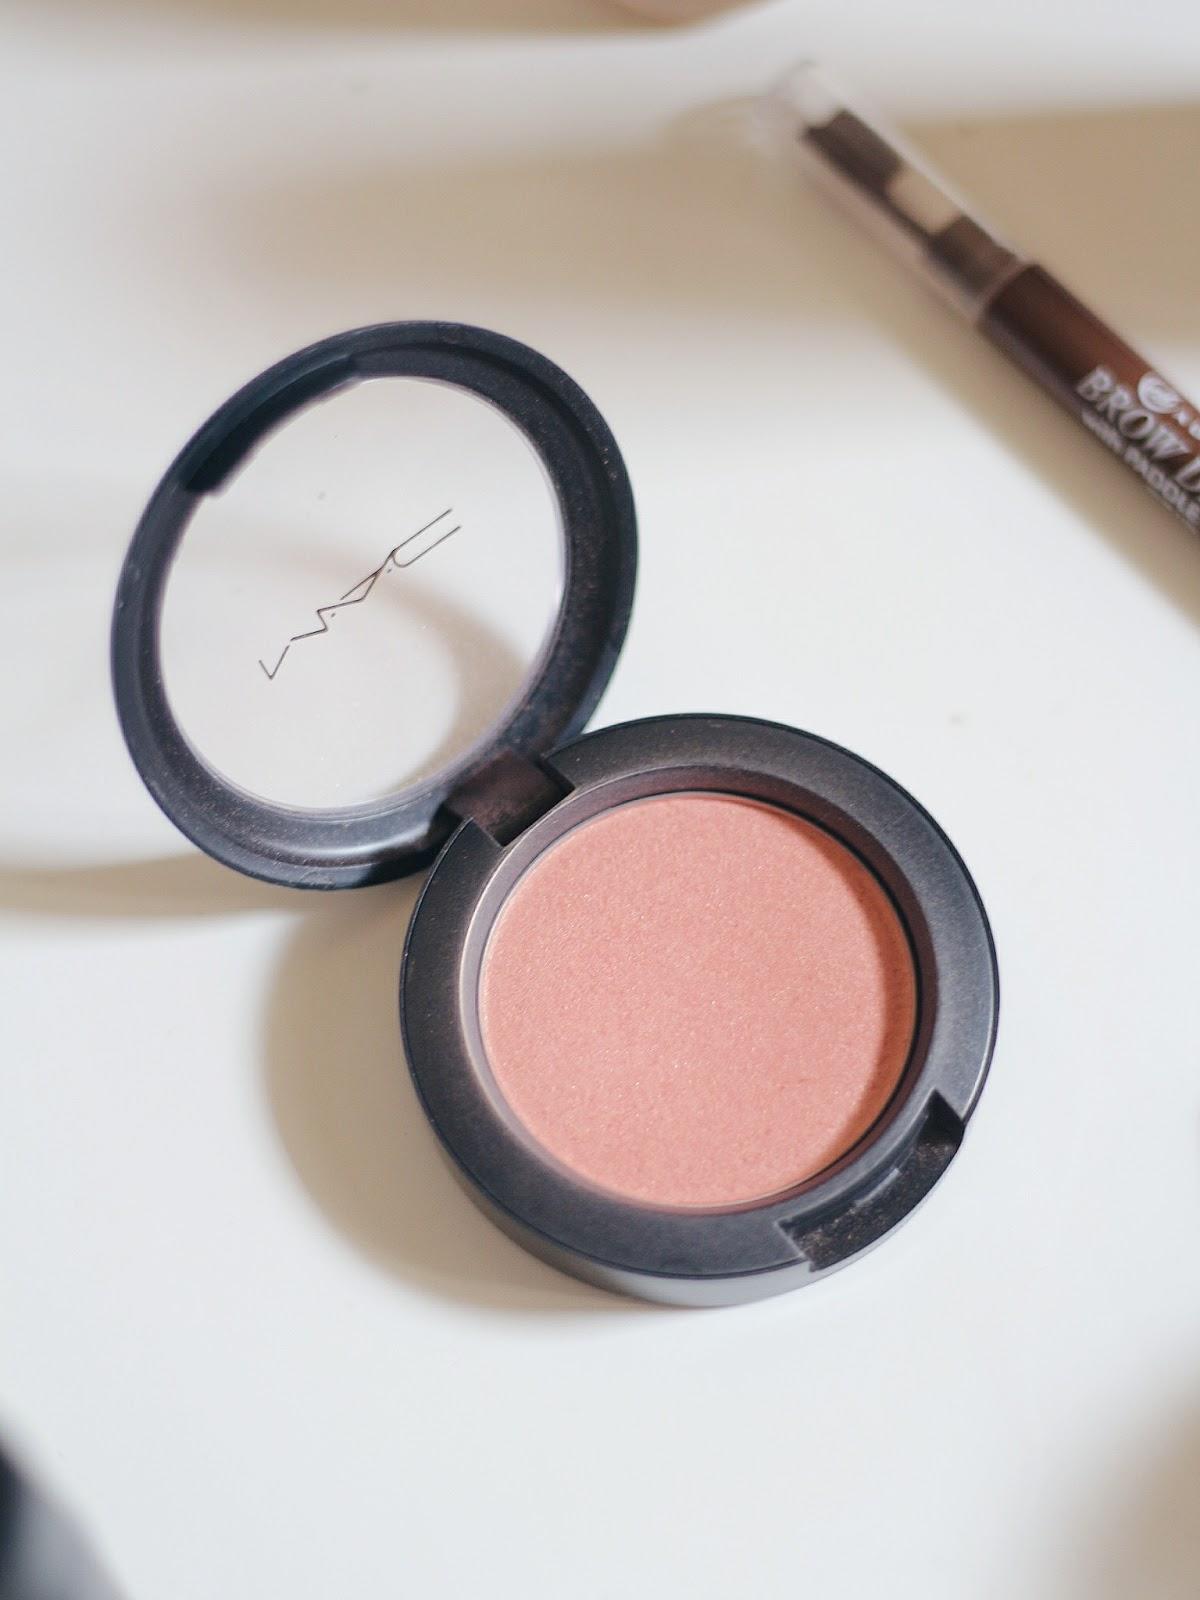 MAC Cosmetics Springsheen Blush